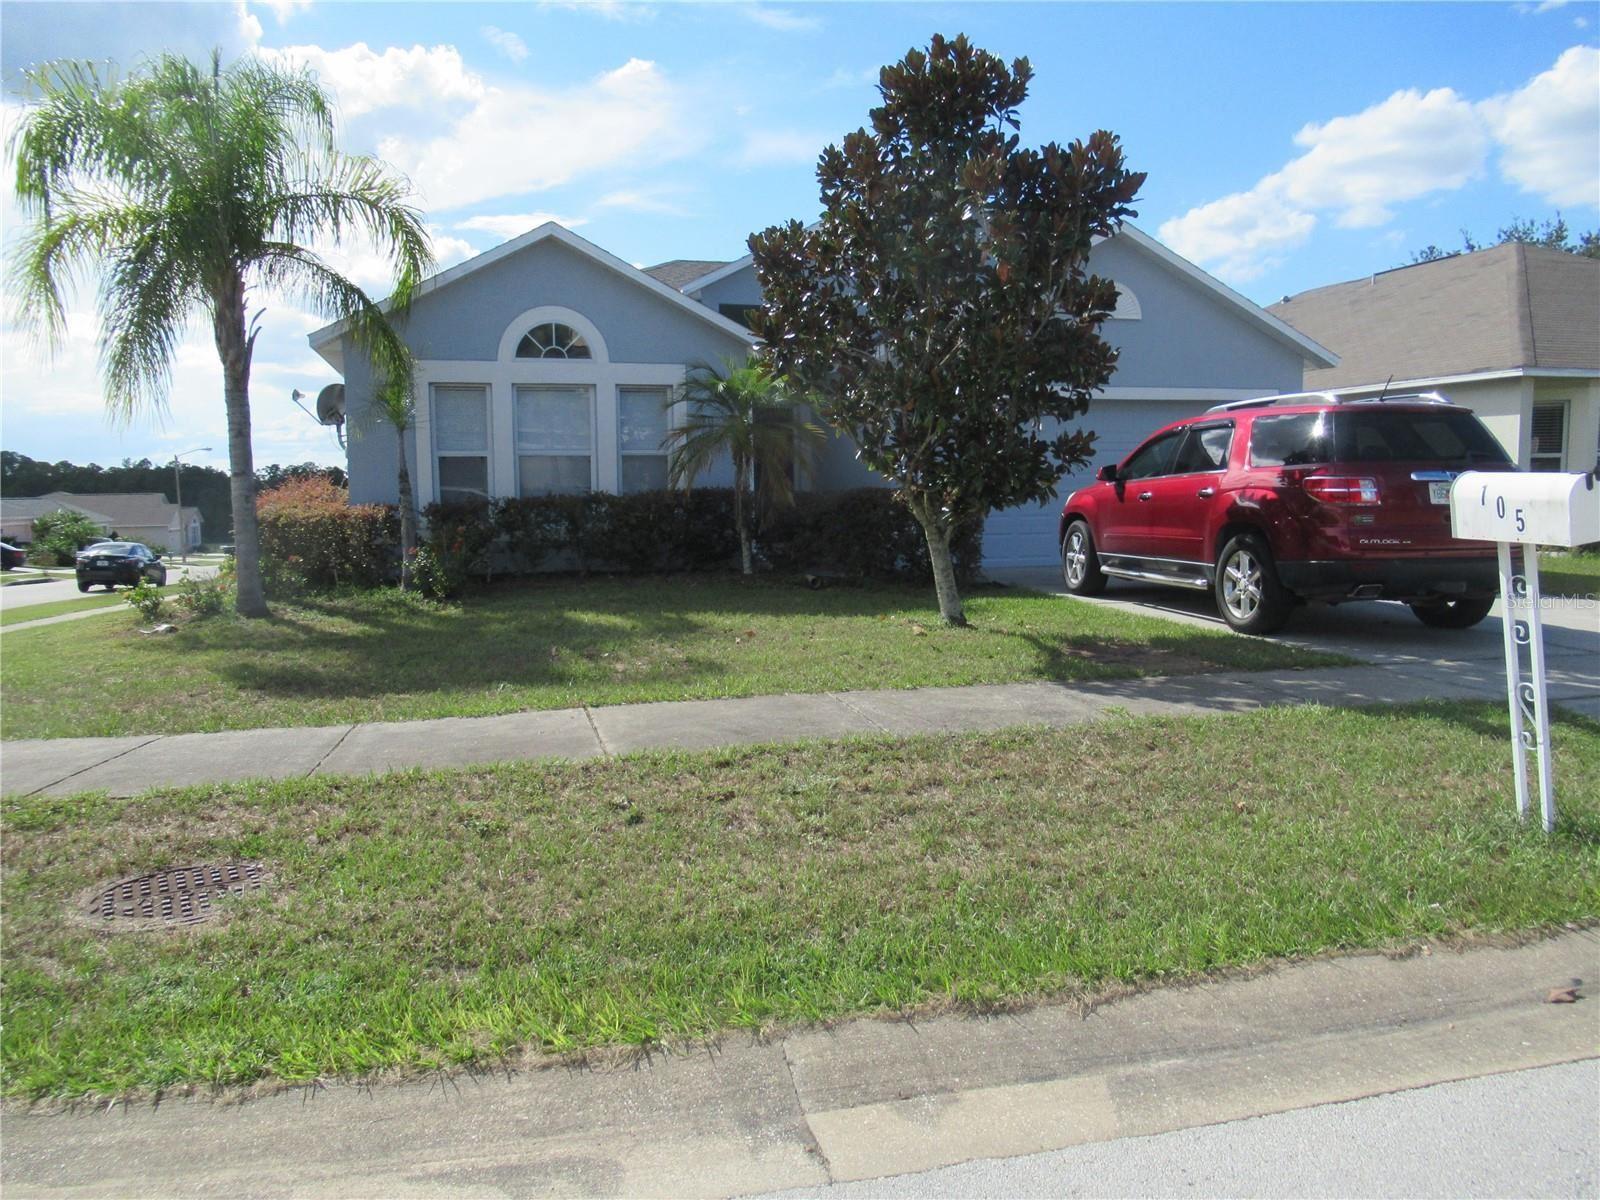 Photo of 105 KESWICK AVENUE, DAVENPORT, FL 33897 (MLS # S5056928)